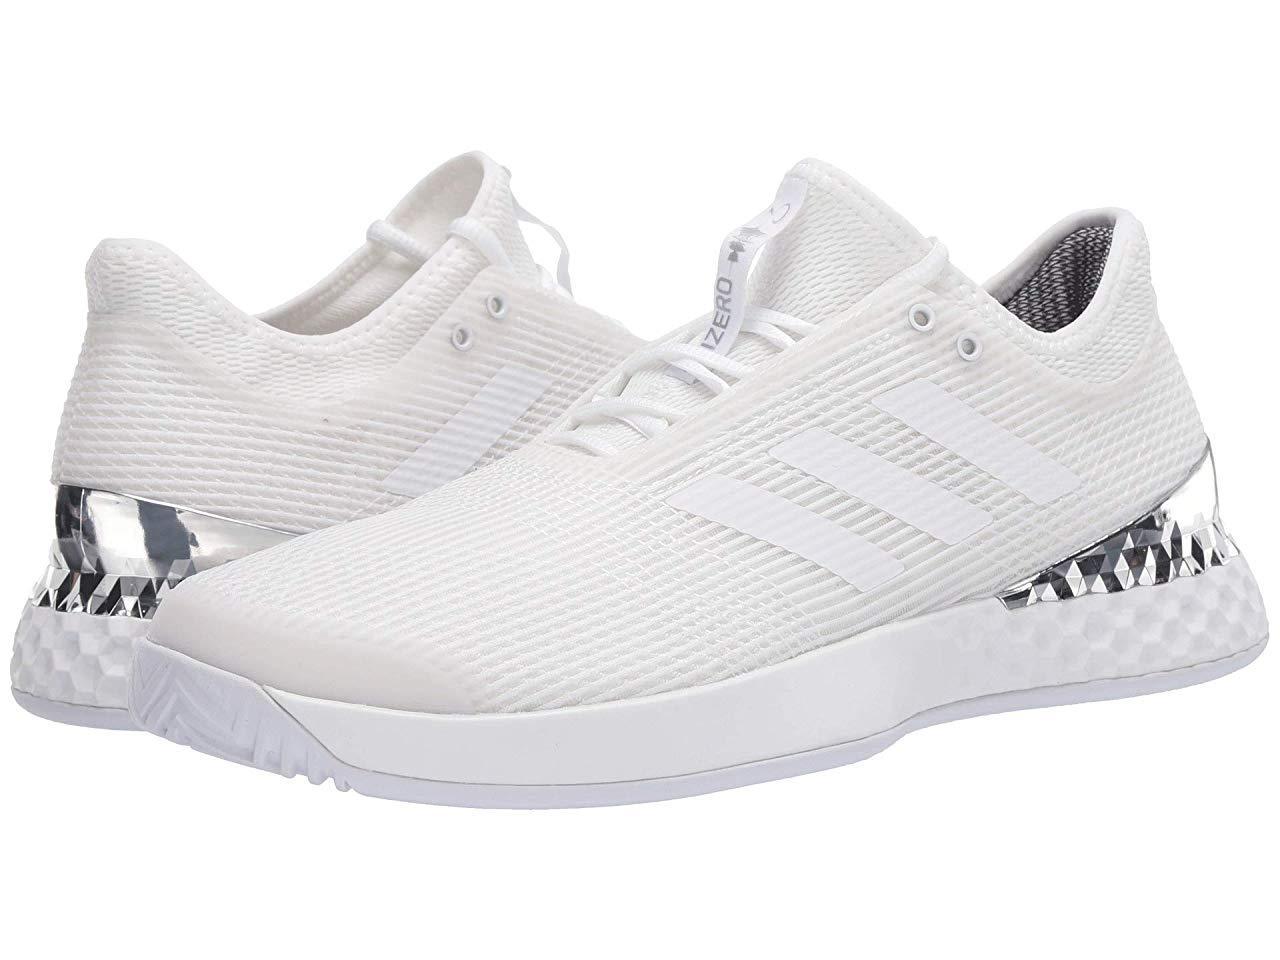 Кроссовки/Кеды adidas Adizero Ubersonic 3 Footwear White/Footwear White/Silver Metallic